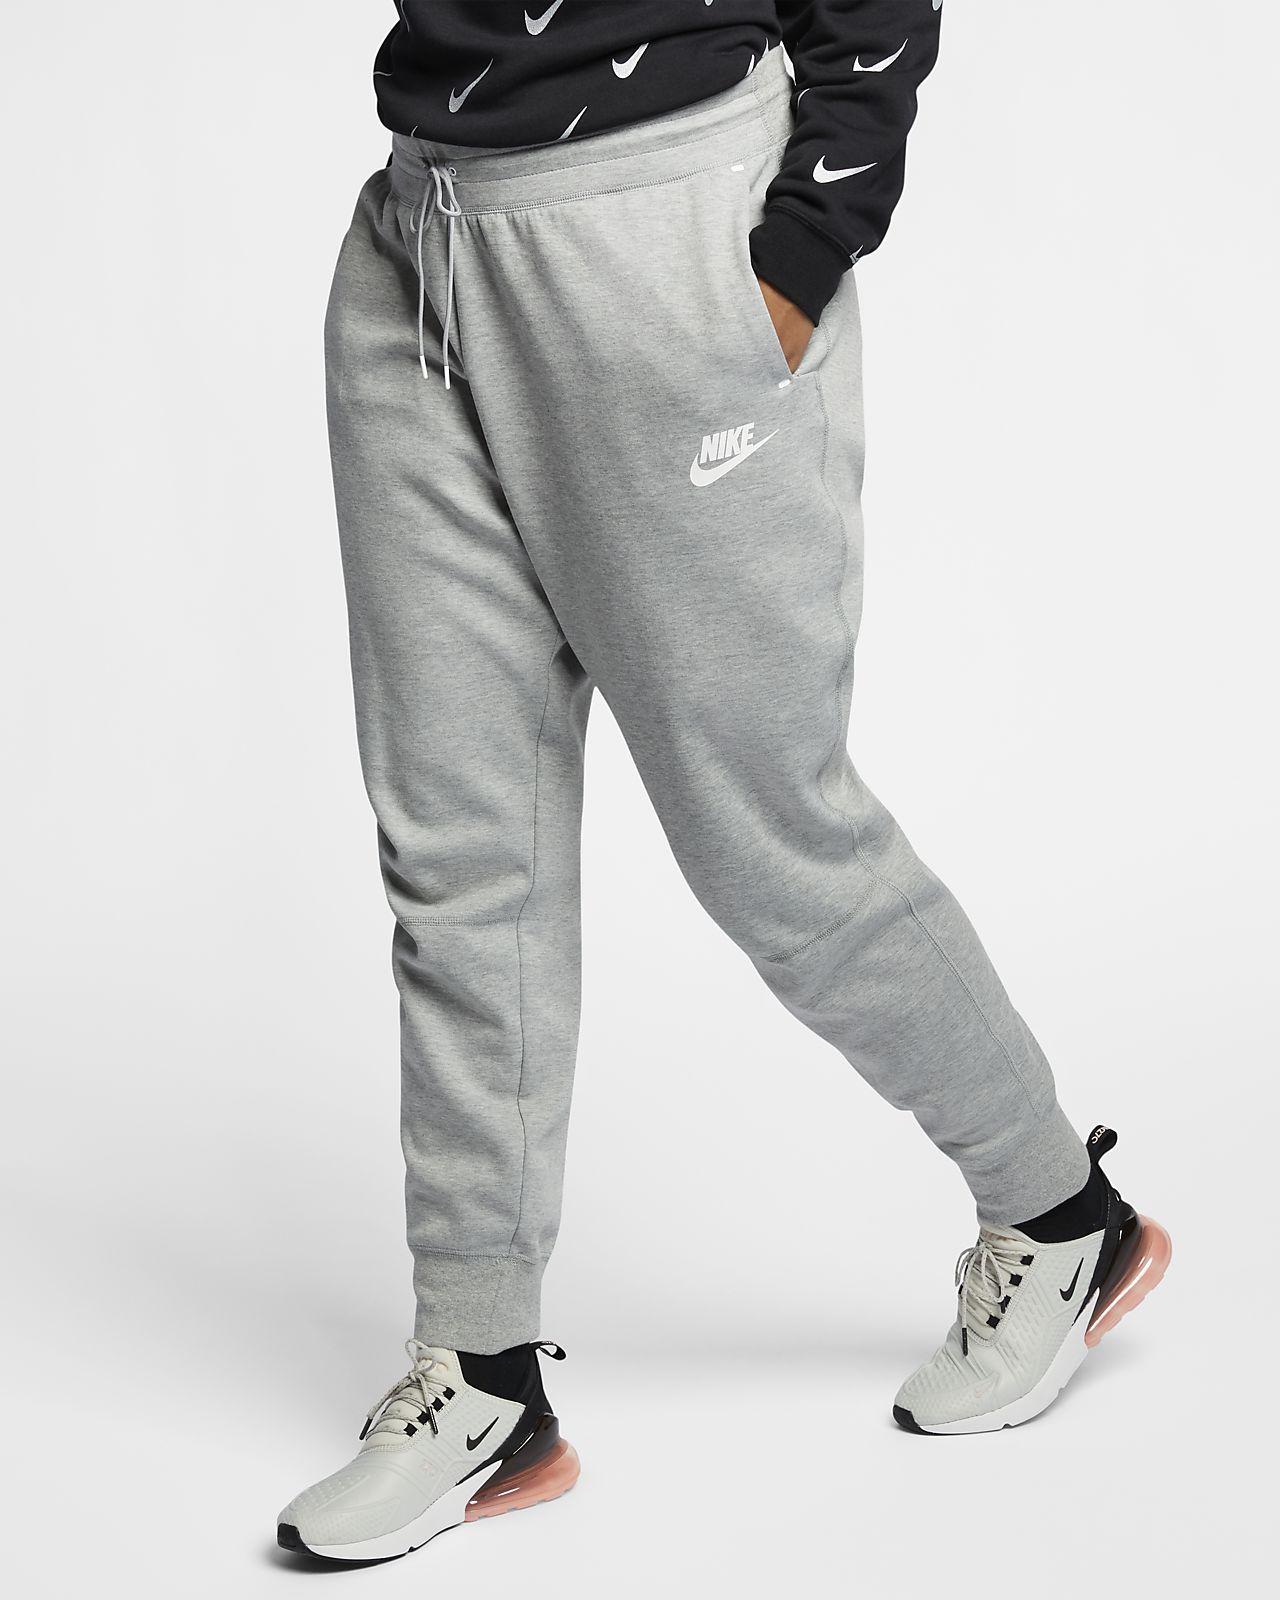 ce3bf44fcad78 Pantalones para mujer talla grande Nike Sportswear Tech Fleece. Nike ...